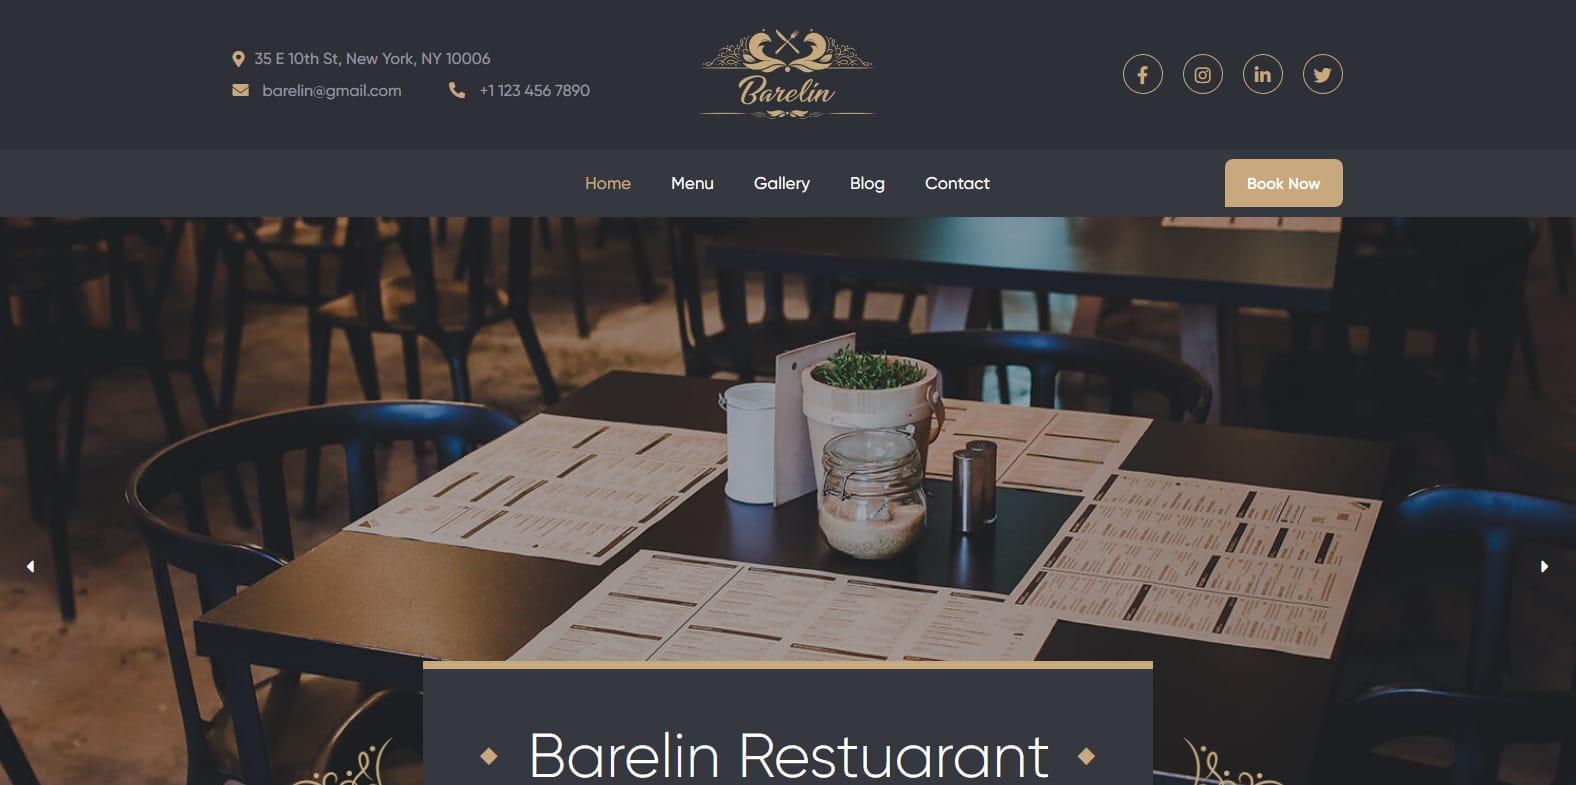 barelin-cafe-restaurant-website-template